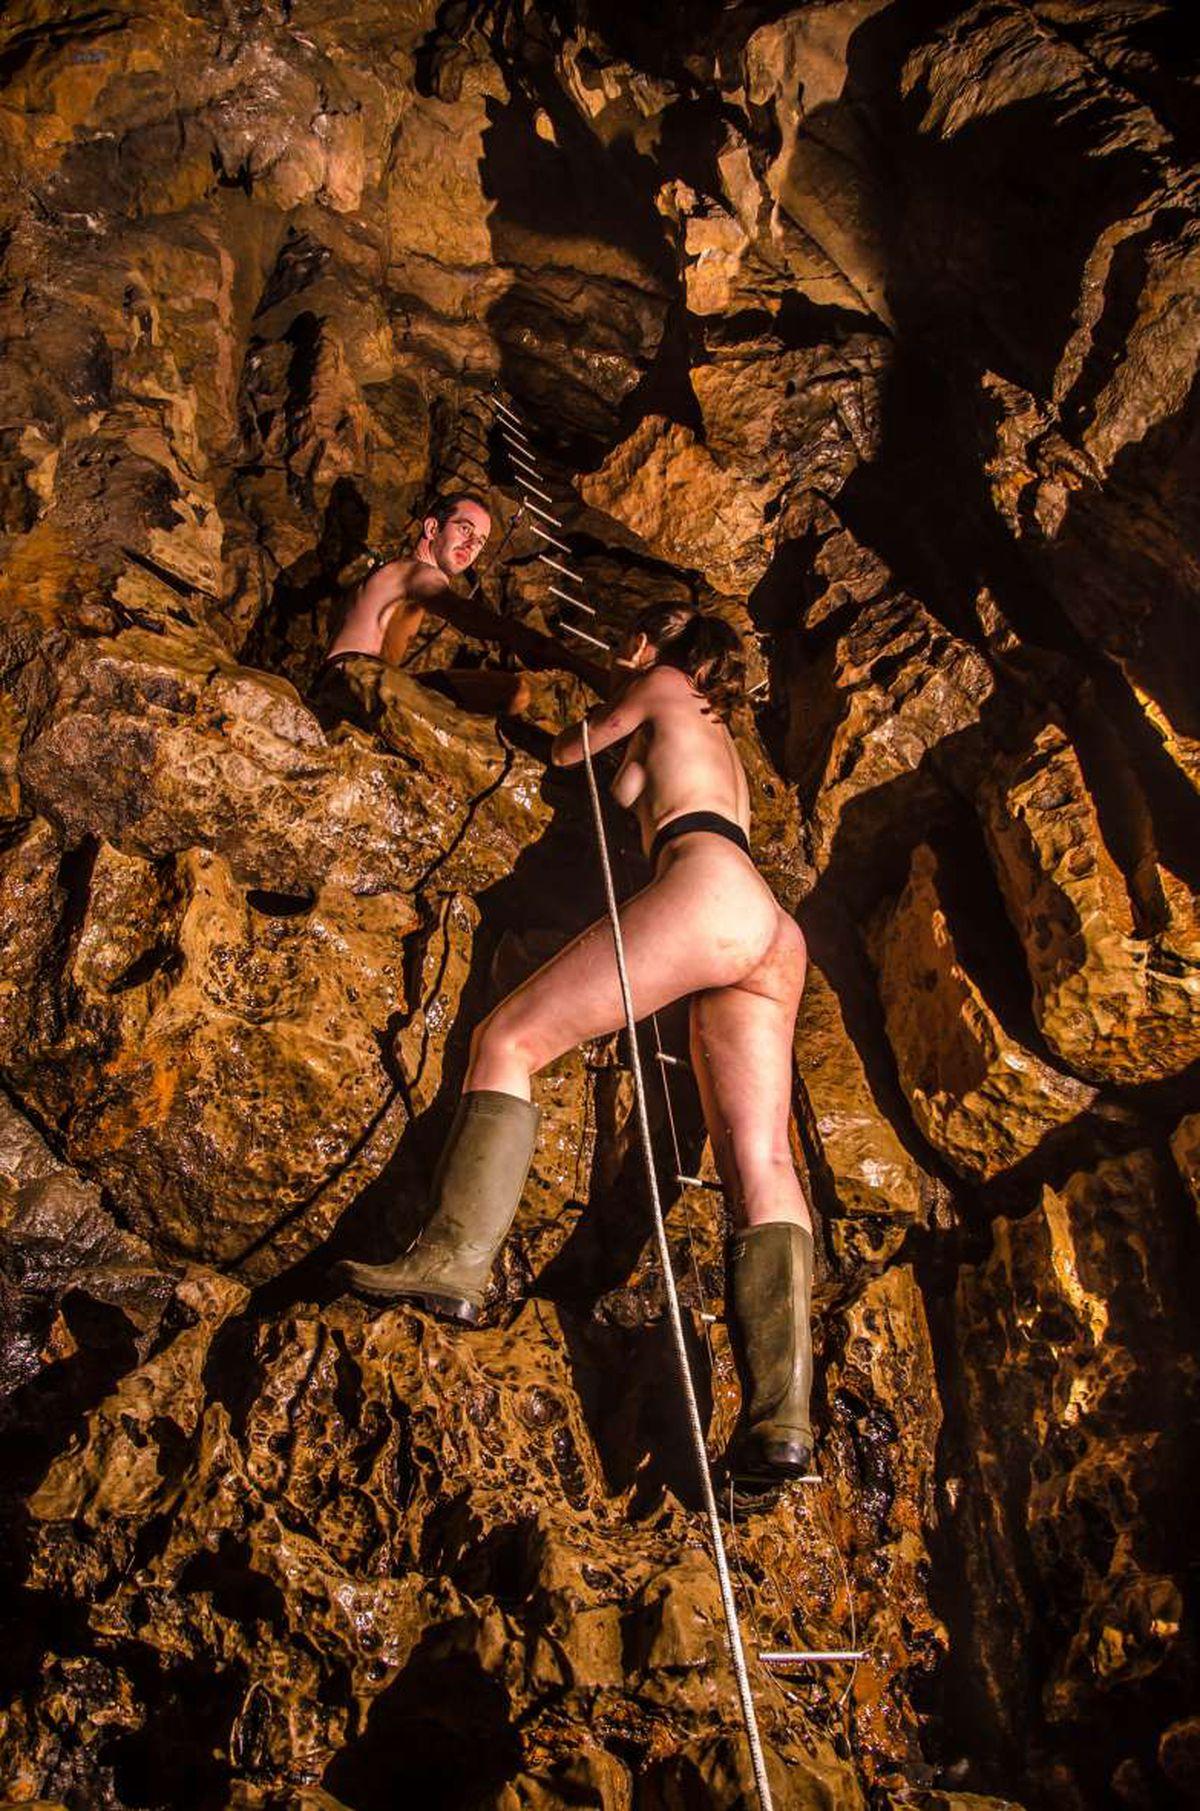 Hockey Girl Wallpaper Cavers Strip Down Underground For Nude Charity Calendar